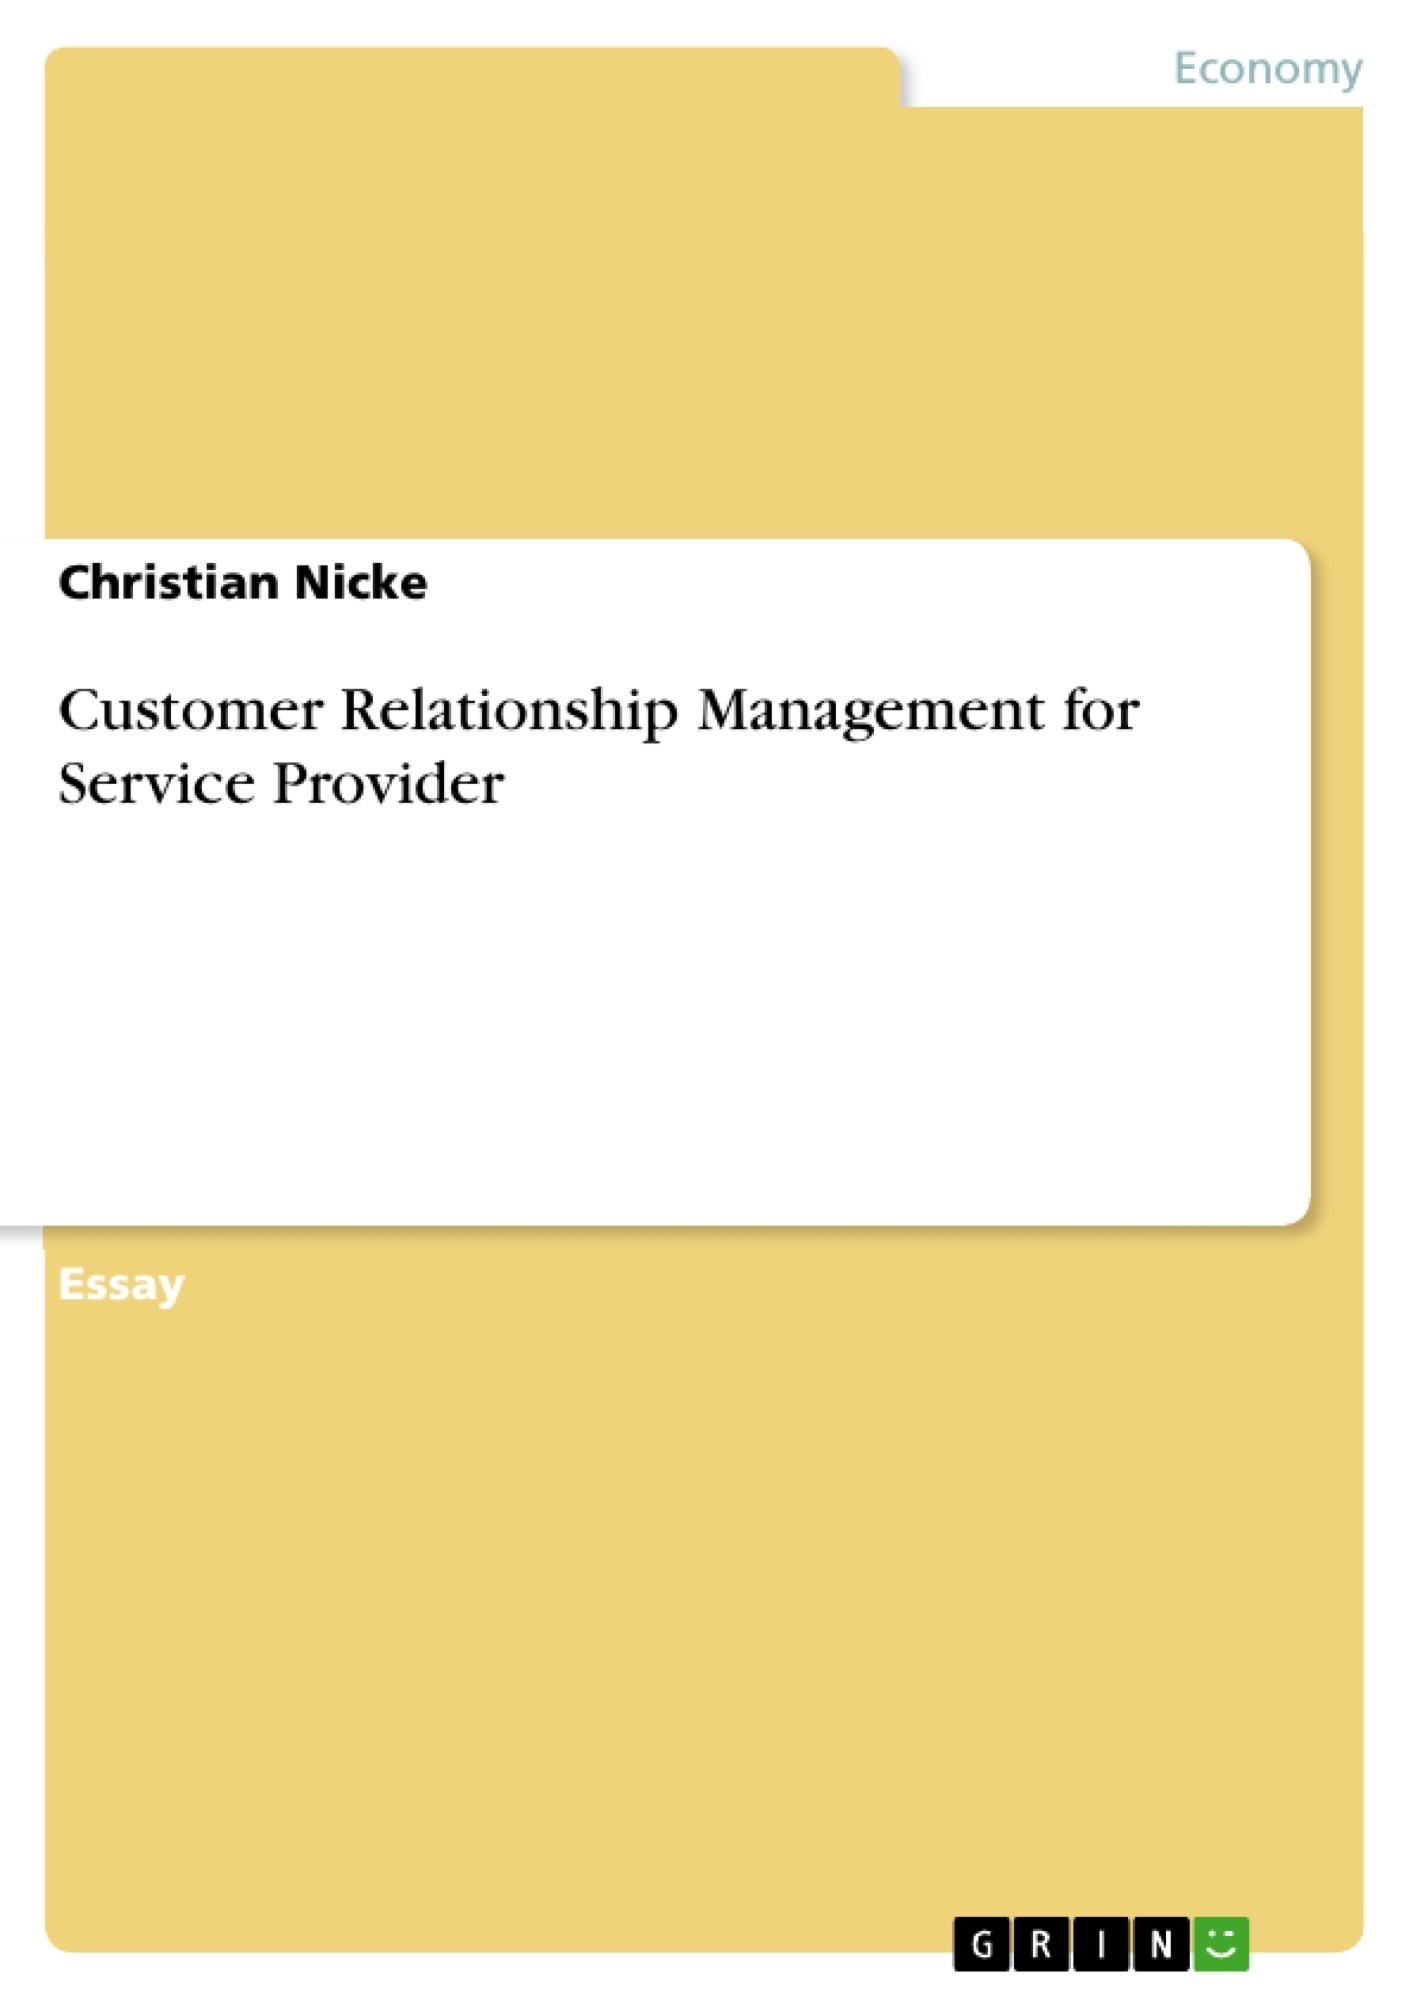 Title: Customer Relationship Management for Service Provider